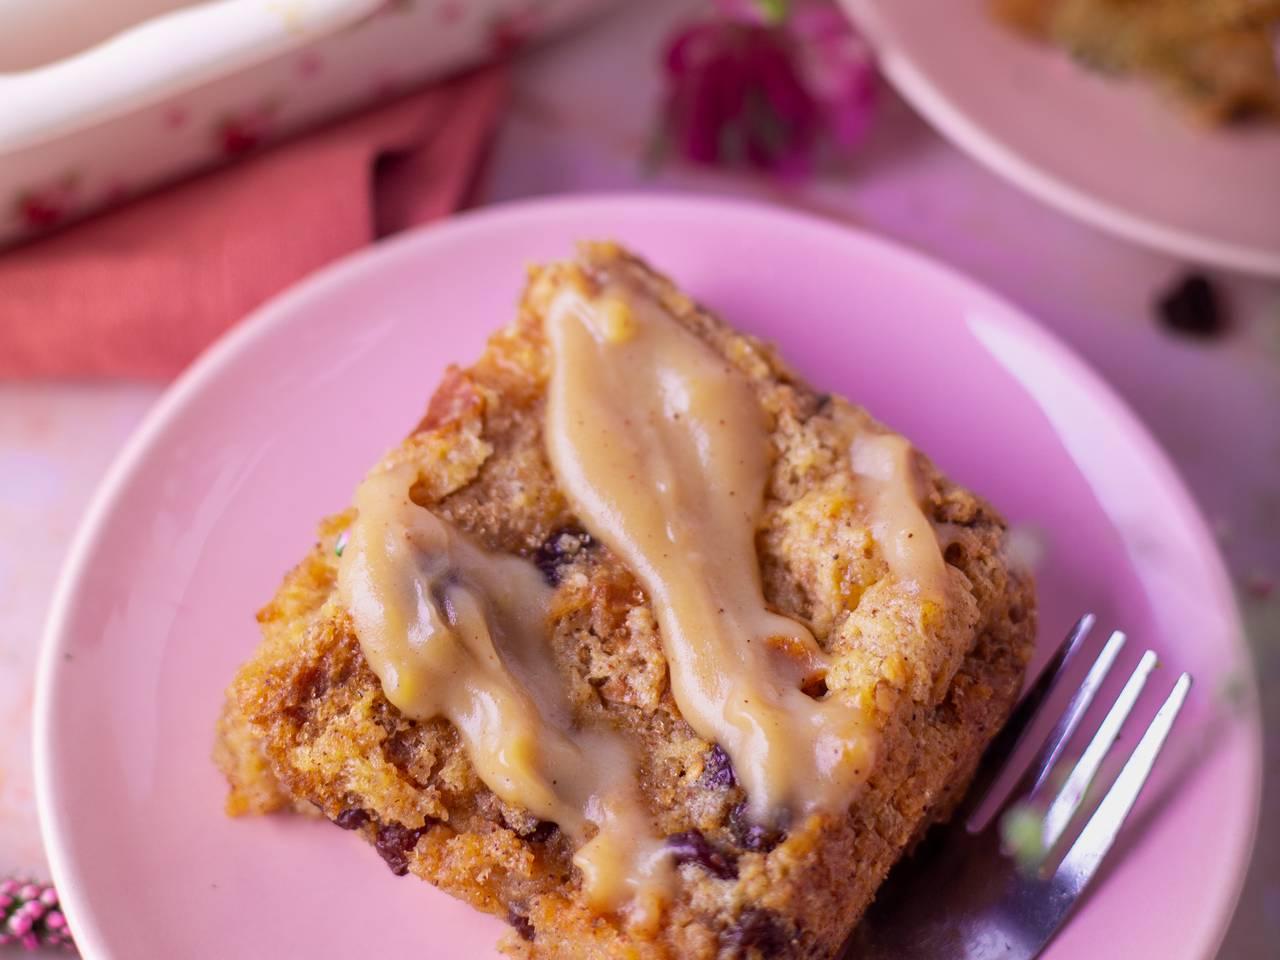 Cinnamon Raisins Bread Pudding with Homemade Sauce Recipe